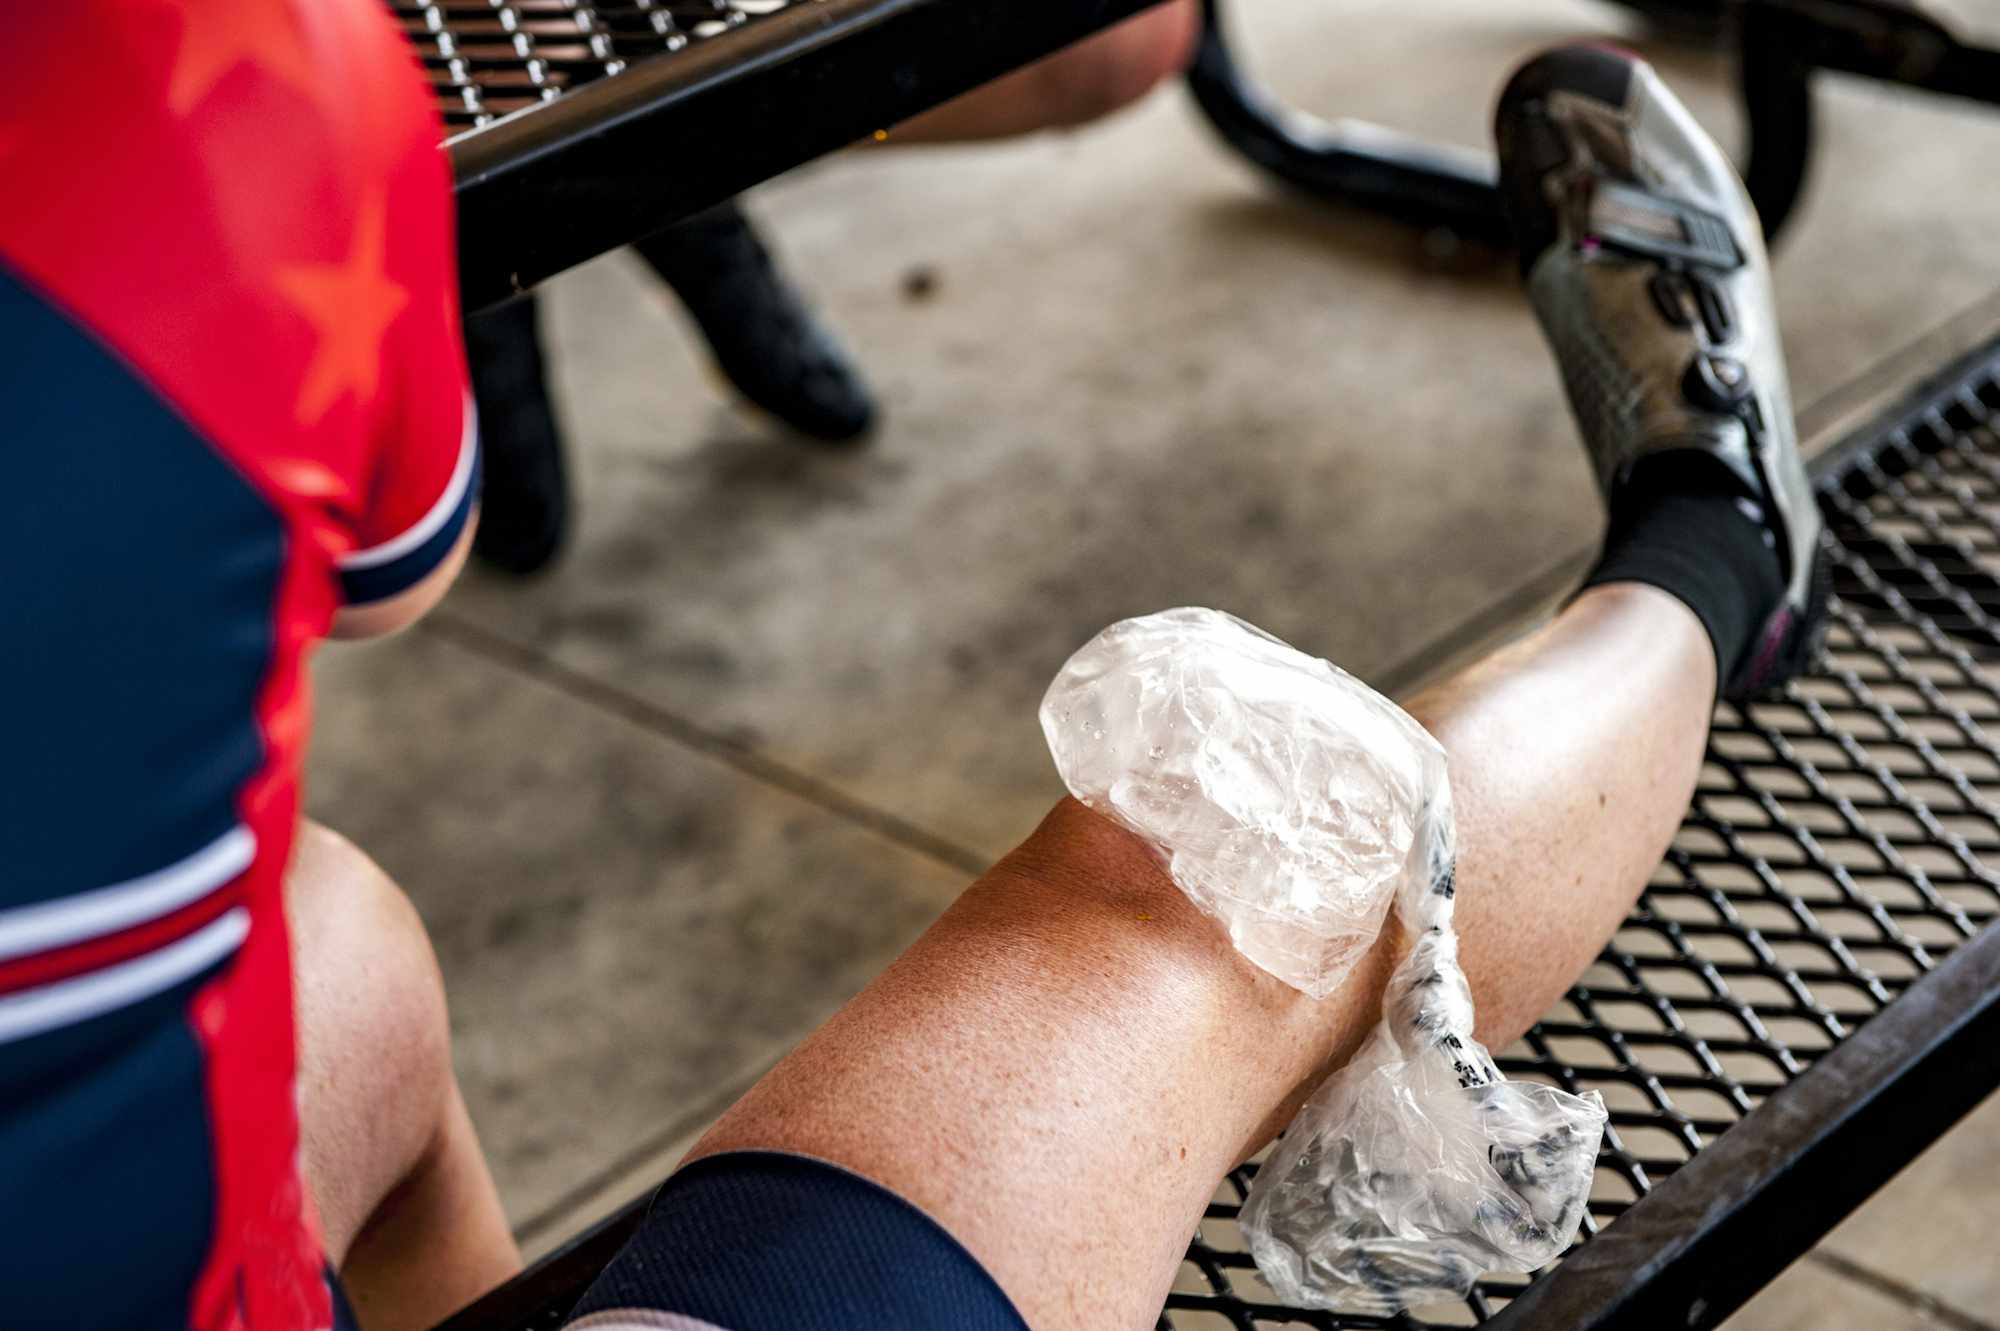 Ice on a knee injury